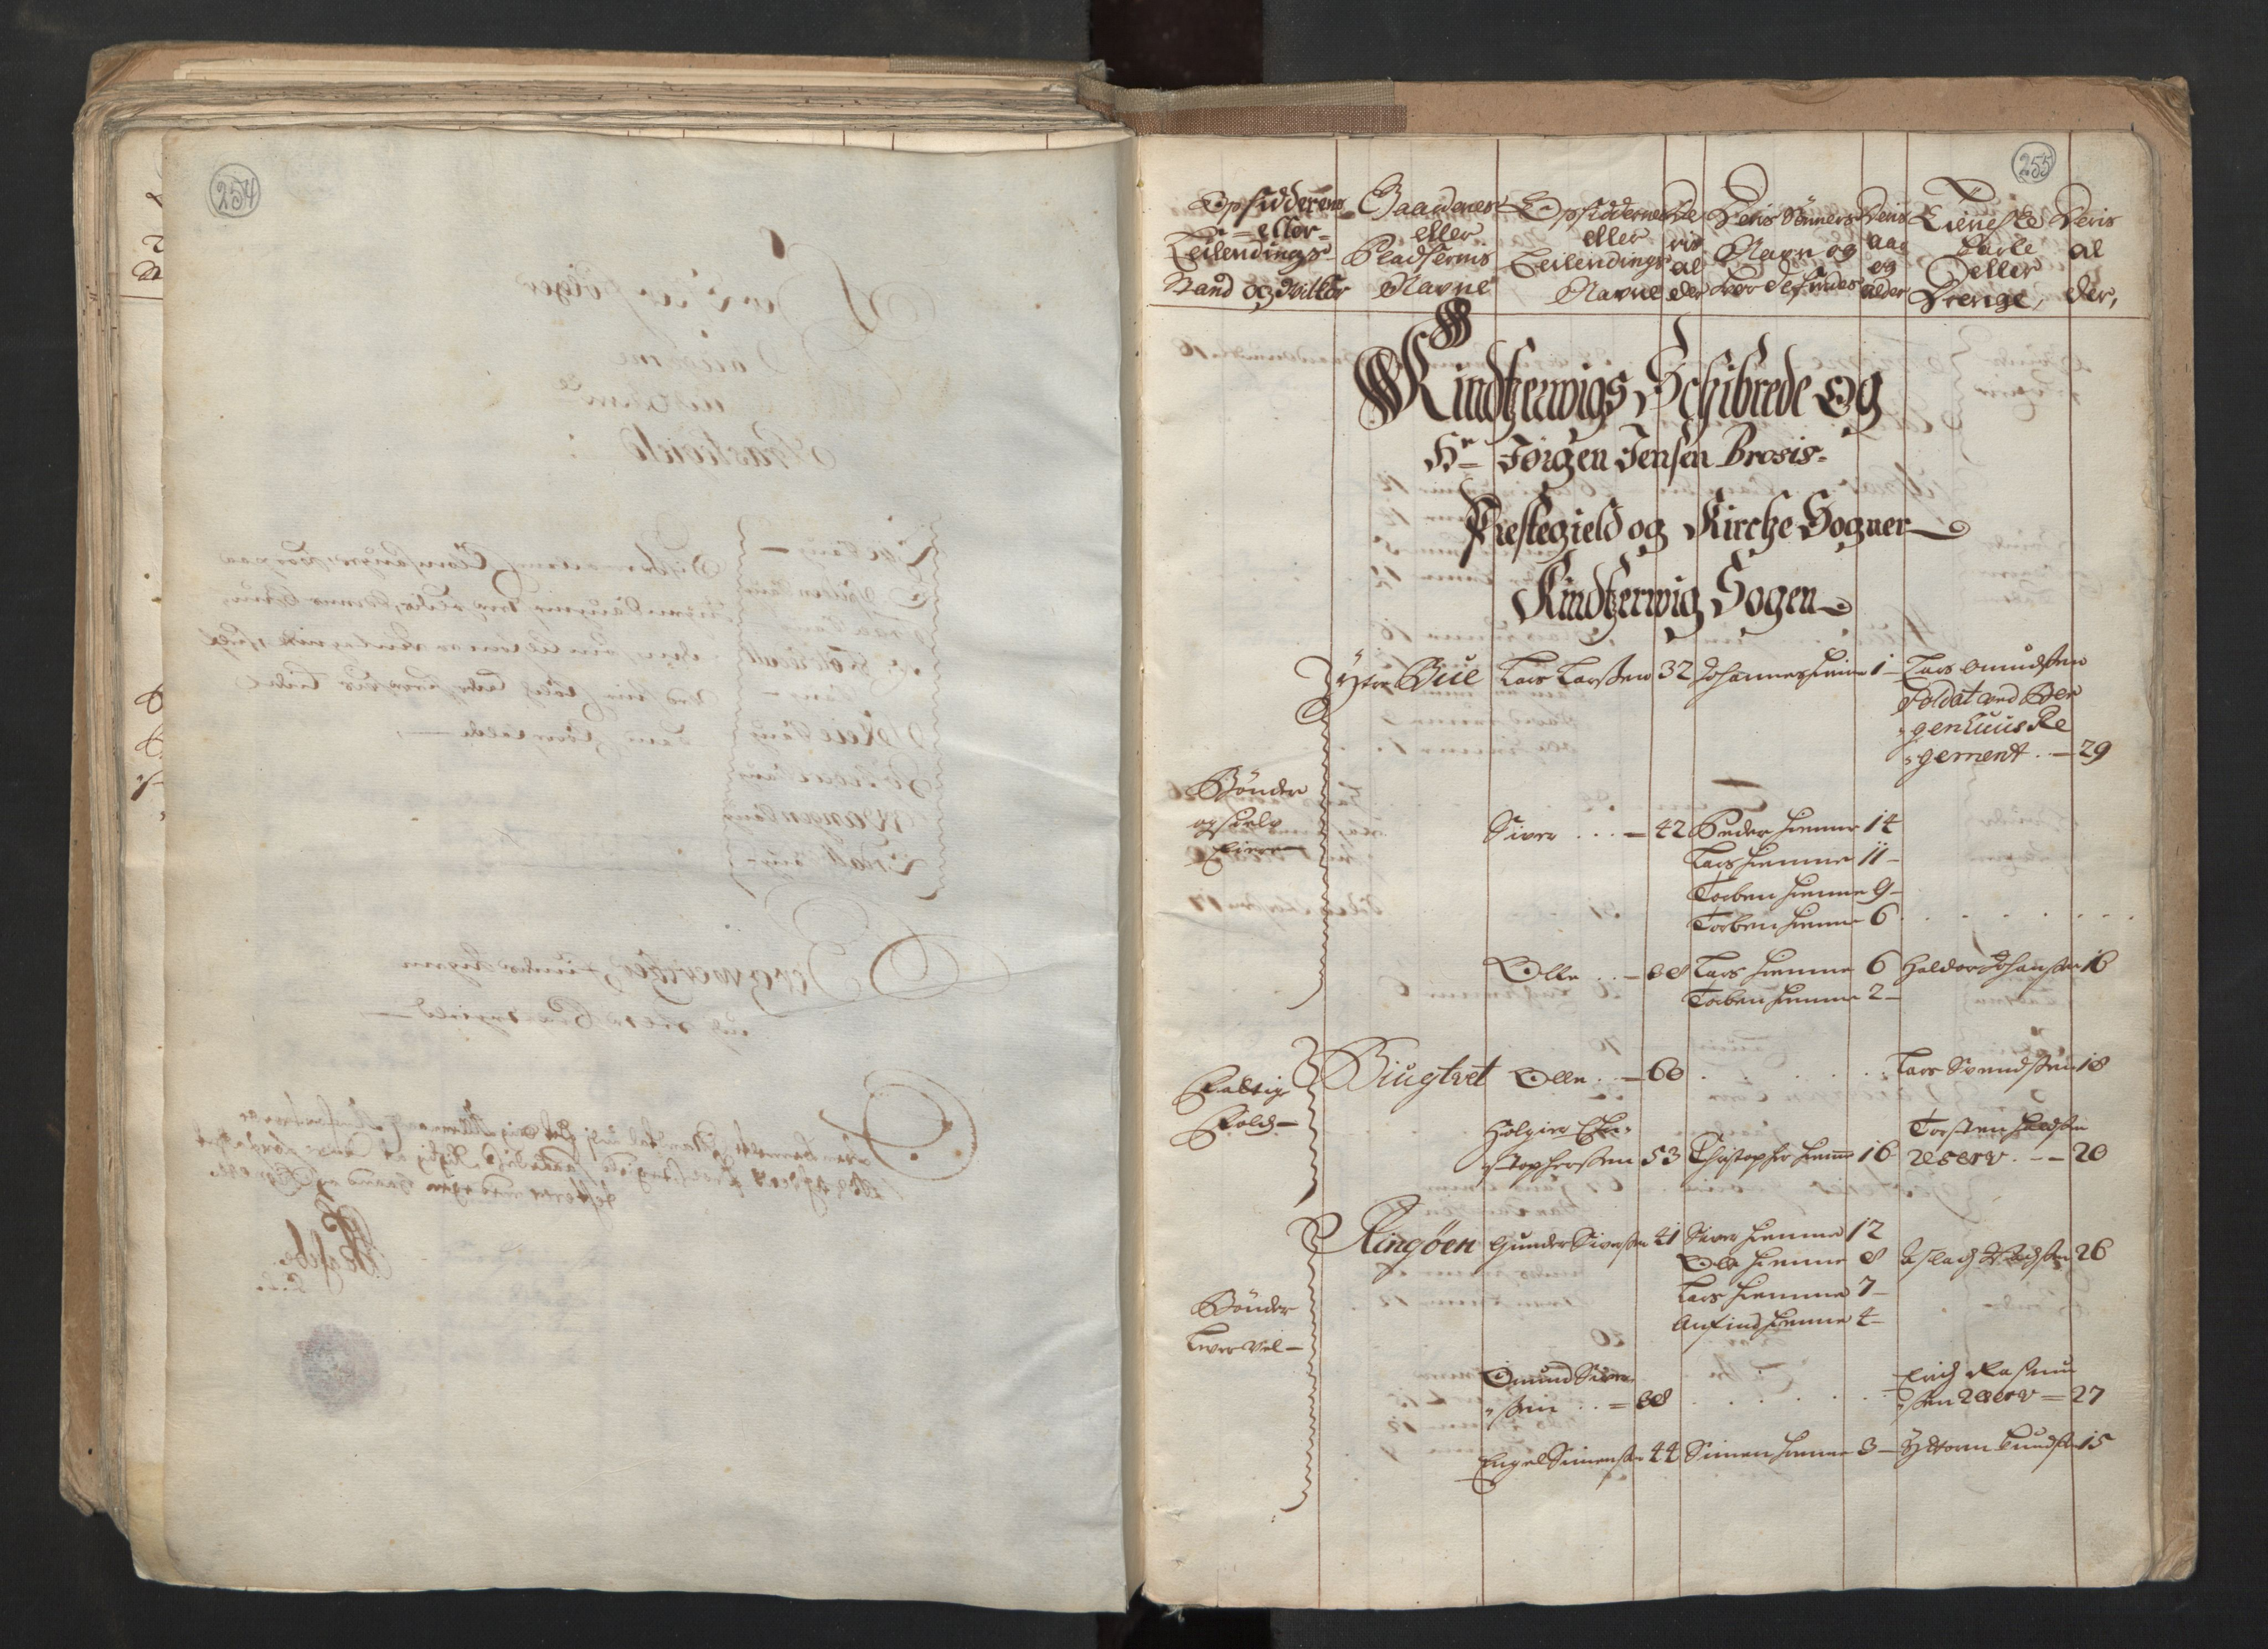 RA, Manntallet 1701, nr. 6: Sunnhordland fogderi og Hardanger fogderi, 1701, s. 254-255